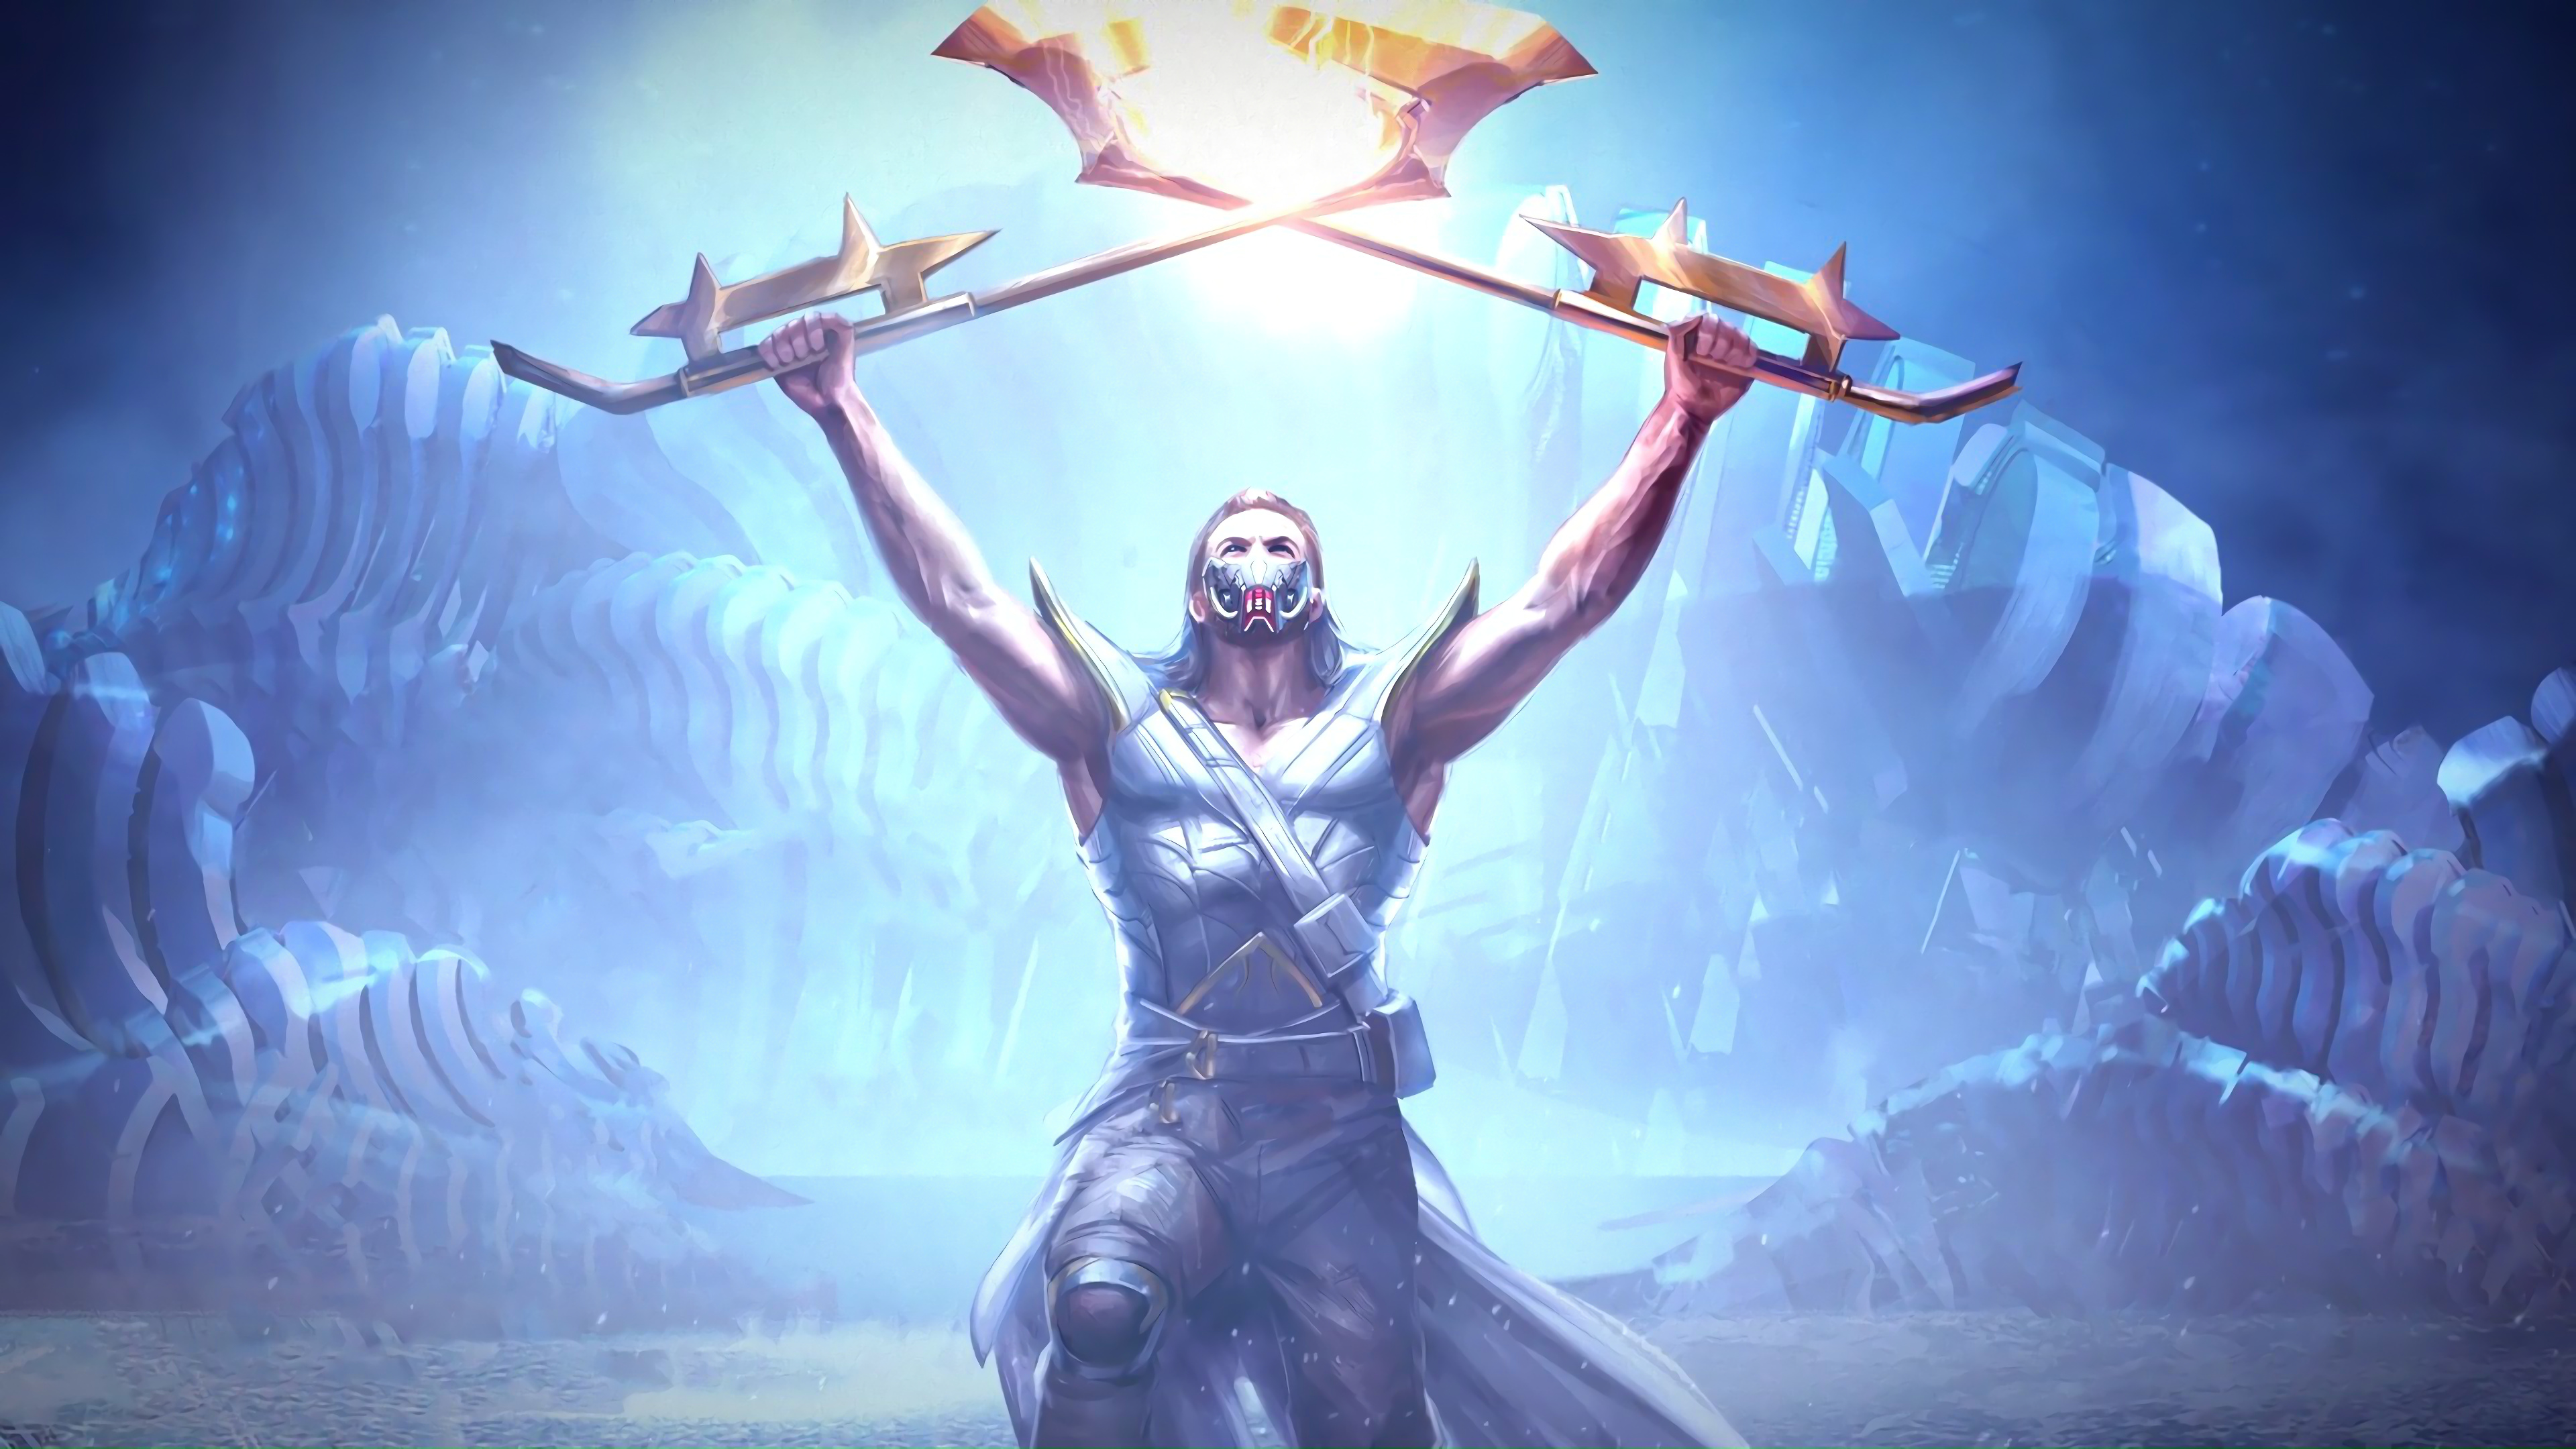 Kabal Mortal Kombat 11 4k Hd Games 4k Wallpapers Images